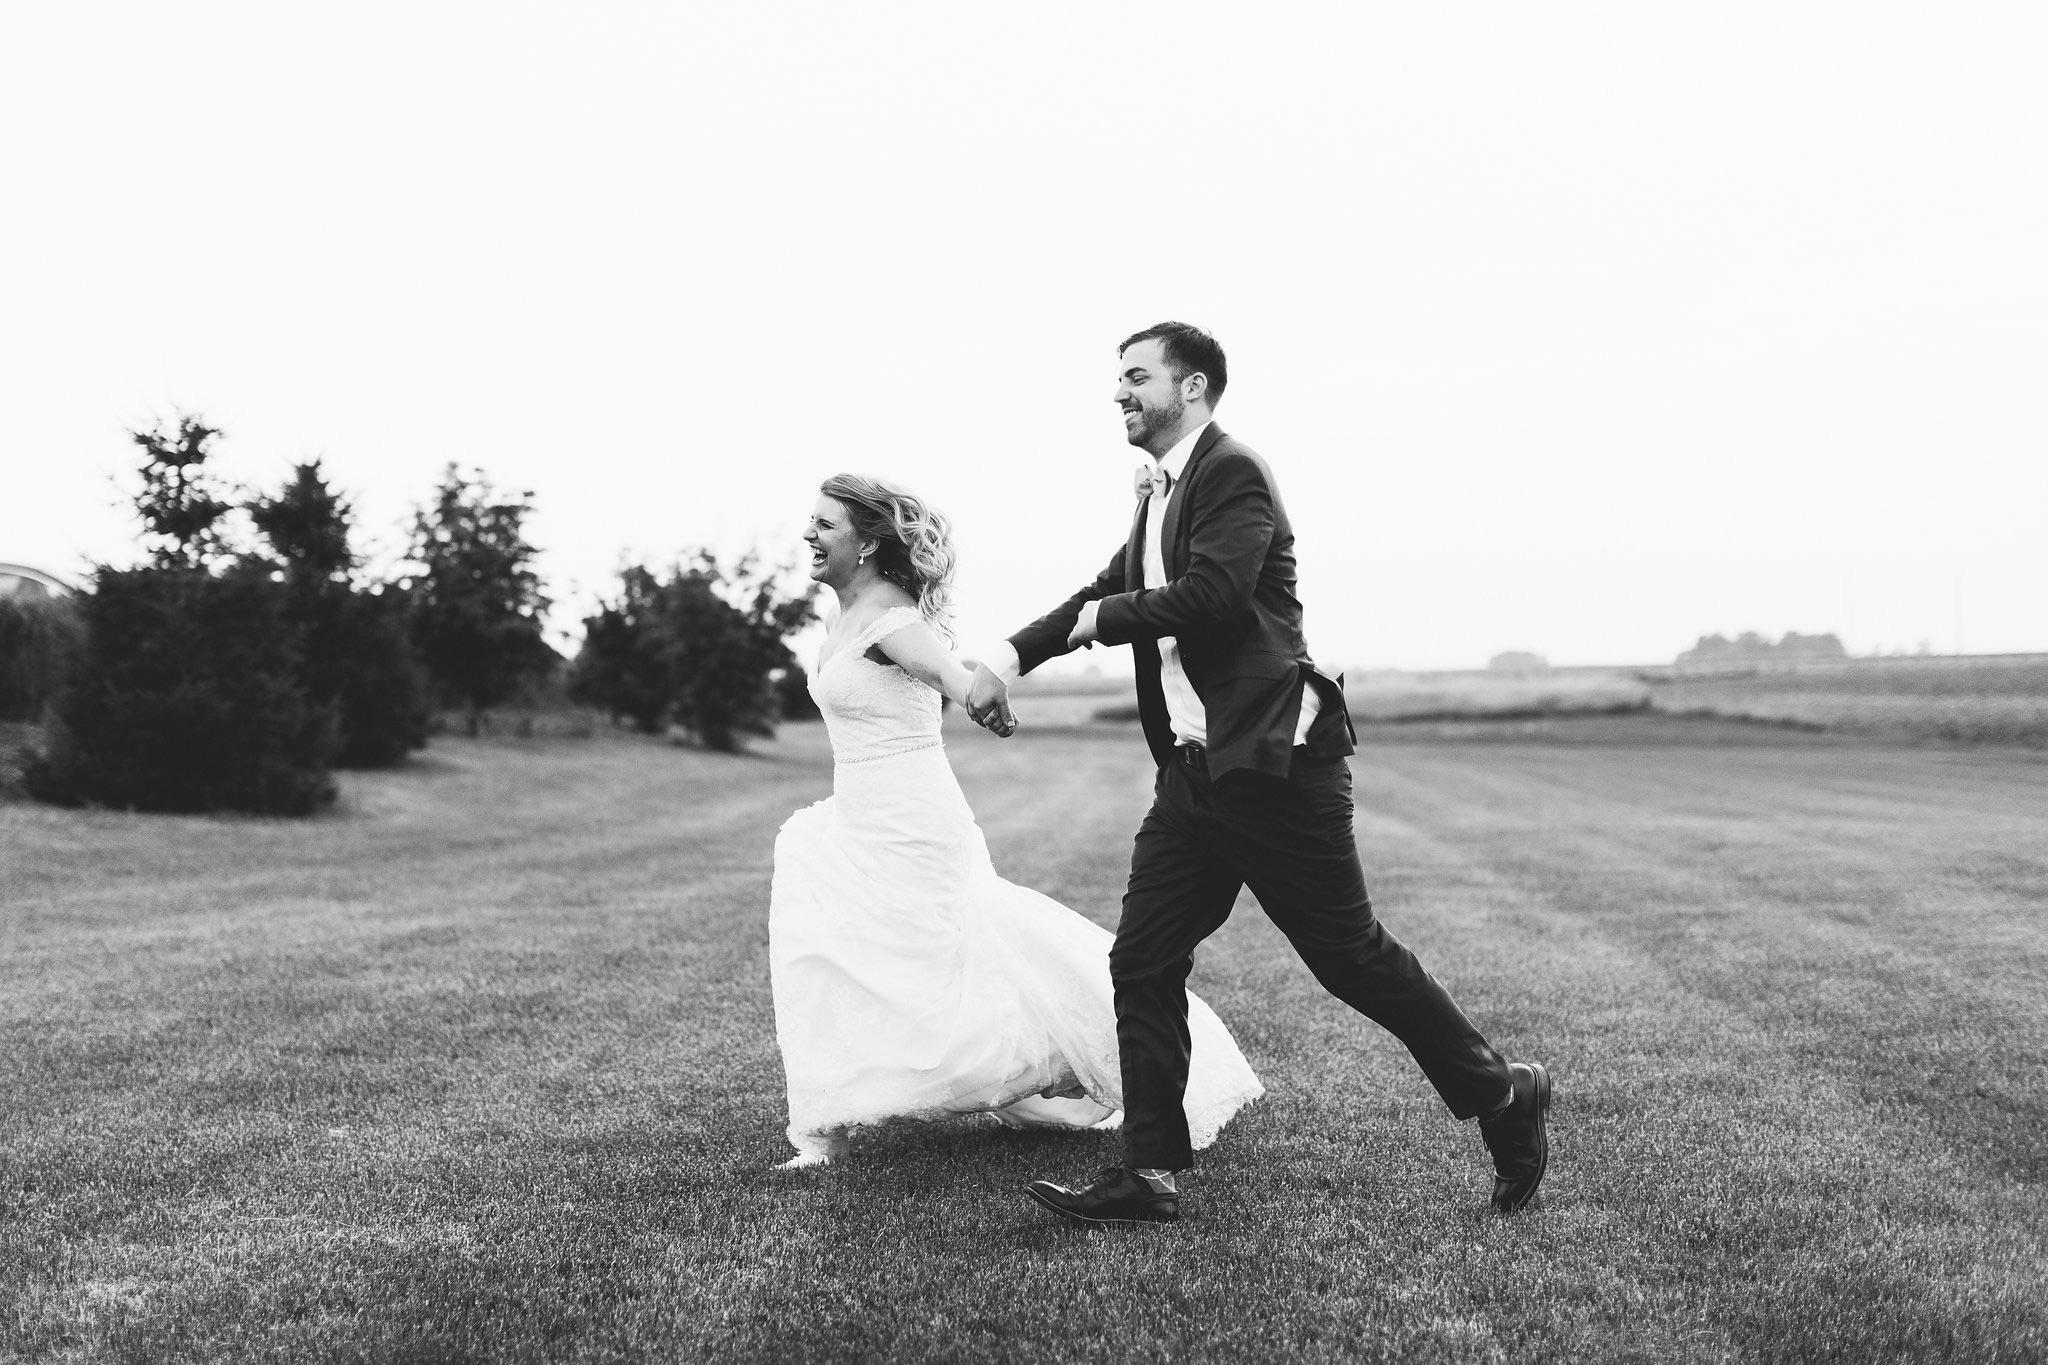 Nicodem-Creative-Wedding-Photography-Champaign-University-of-Illinois-Inspiration-Pear-Tree-Estate-Illini-Hillary-Rae-Events-Flowers-by-Kristine-Meg-and-Matt